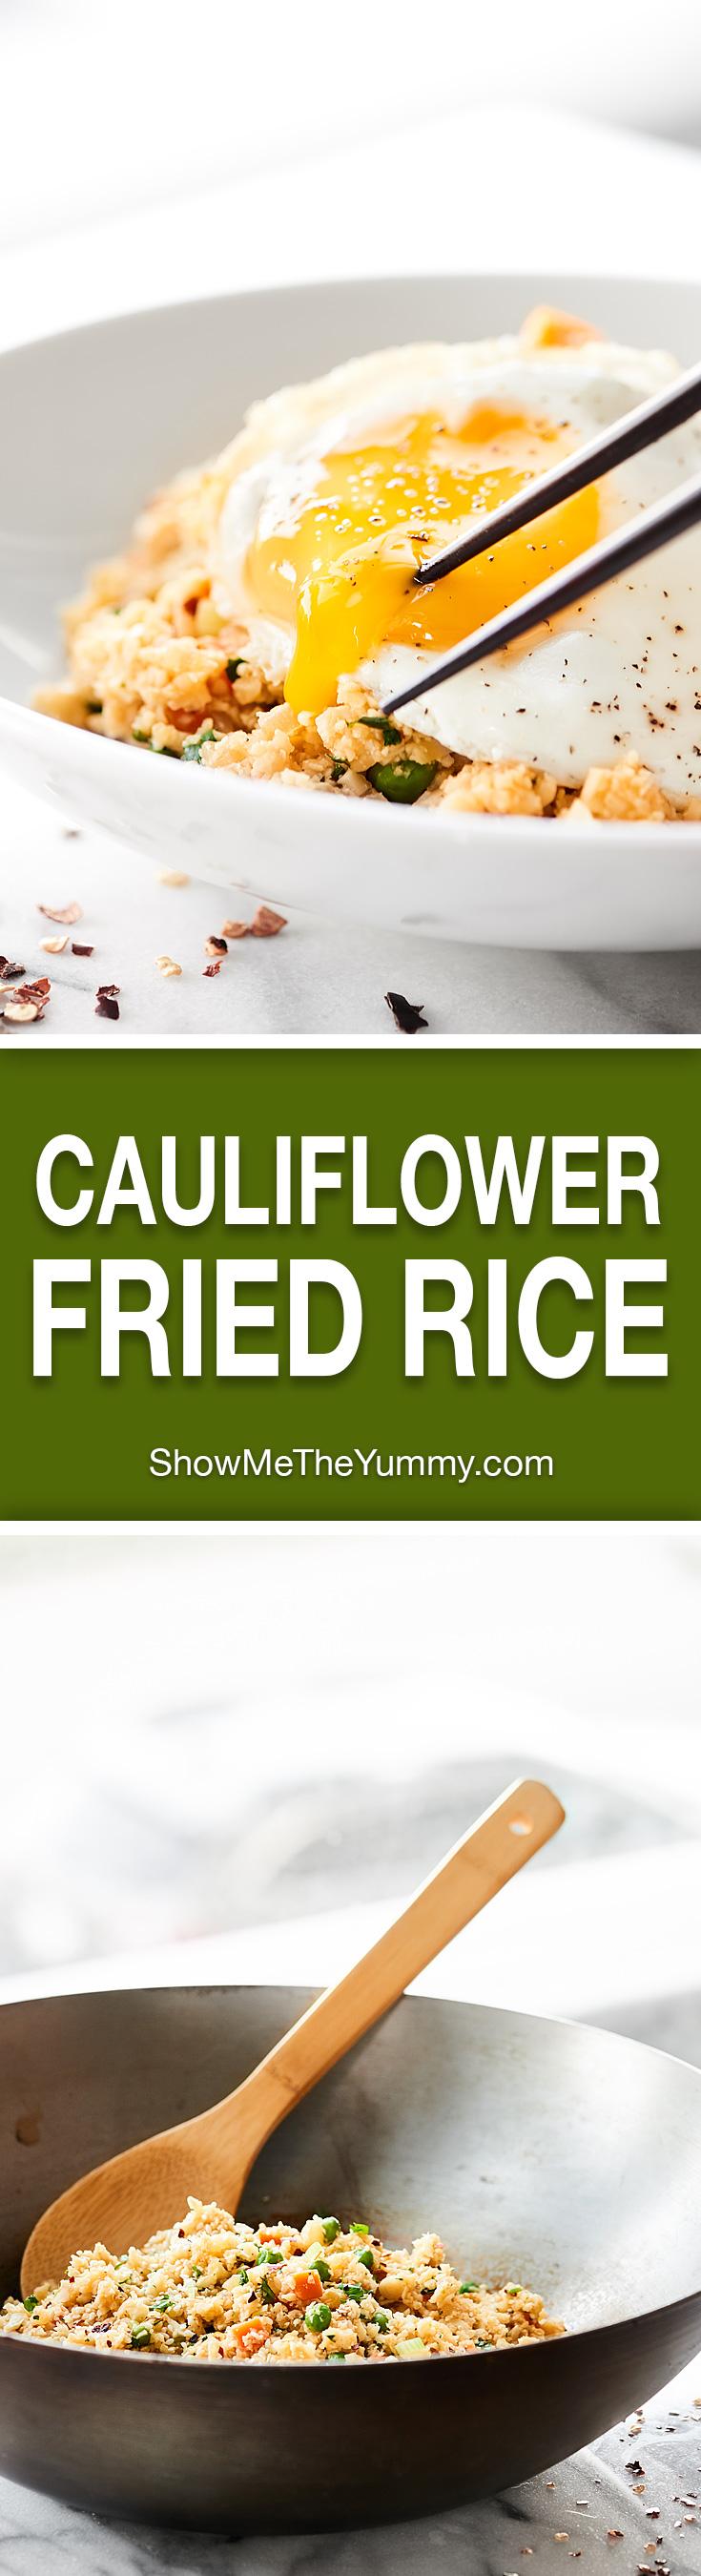 Cauliflower Fried Rice | Food | Pinterest | Comida y Recetas